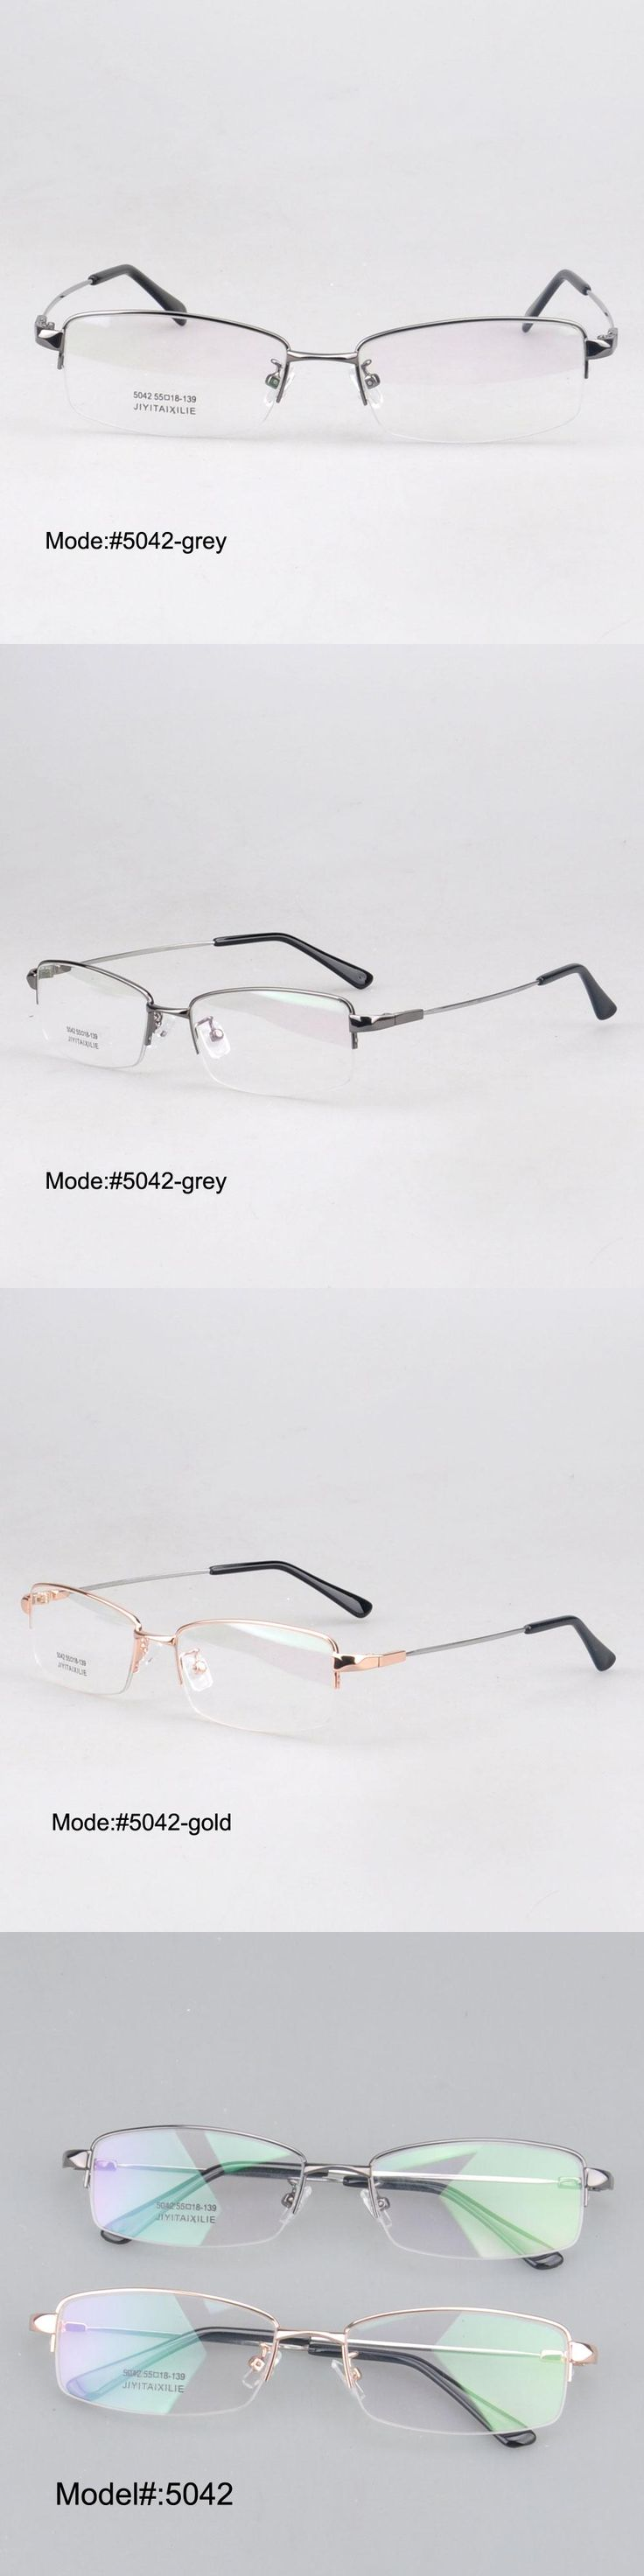 MY DOLI factory price 5042 half rim Memory Titanium Eyeglasses Prescription Spectacle Optical Frame eyewear